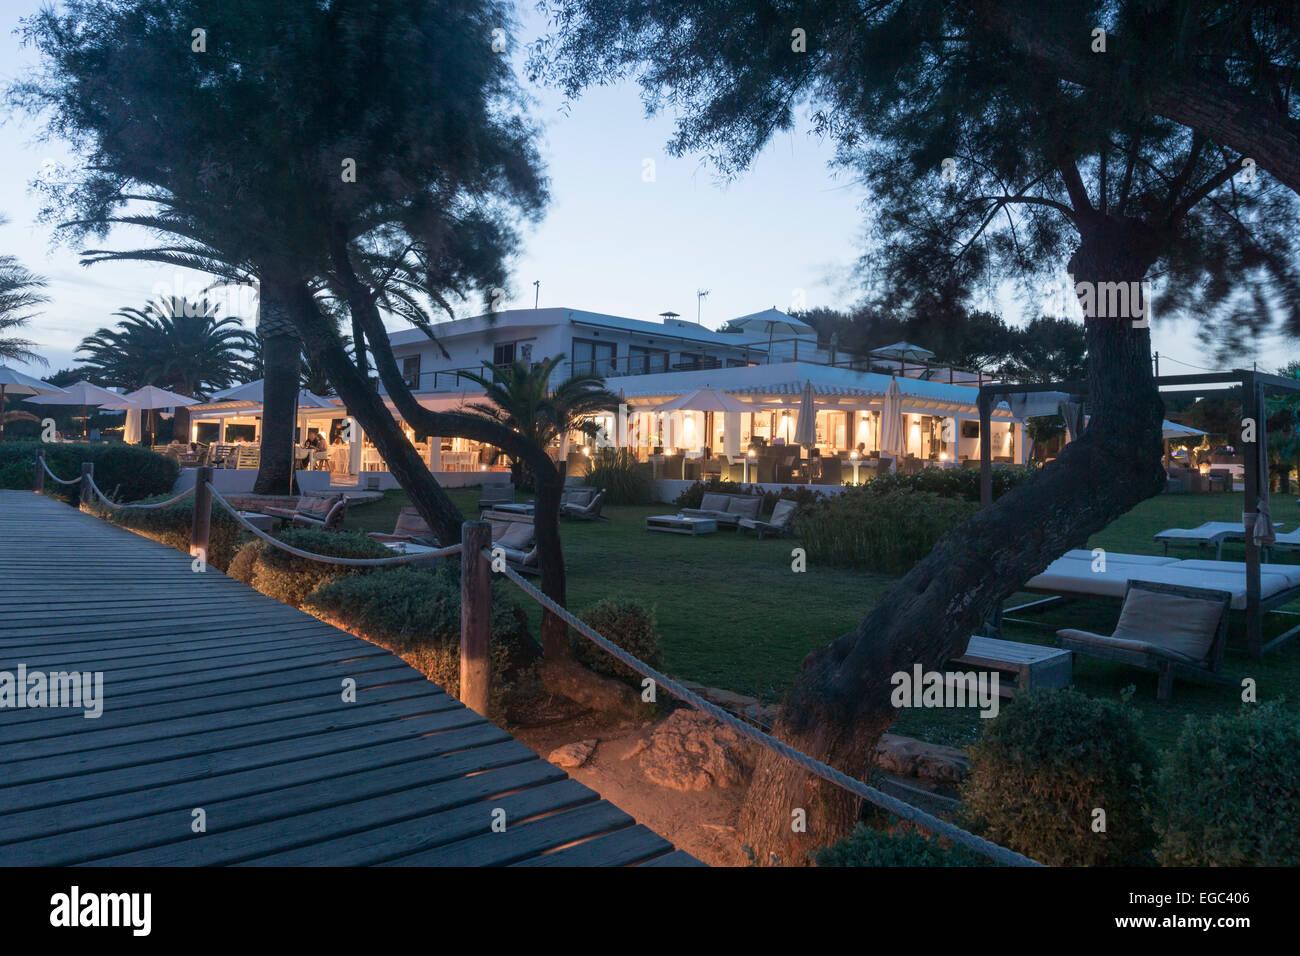 Gecko Hotel Beach Club, Playa Migjom, Ca Mari, Formentera, Islas Baleares, Espagne, Europe, Photo Stock